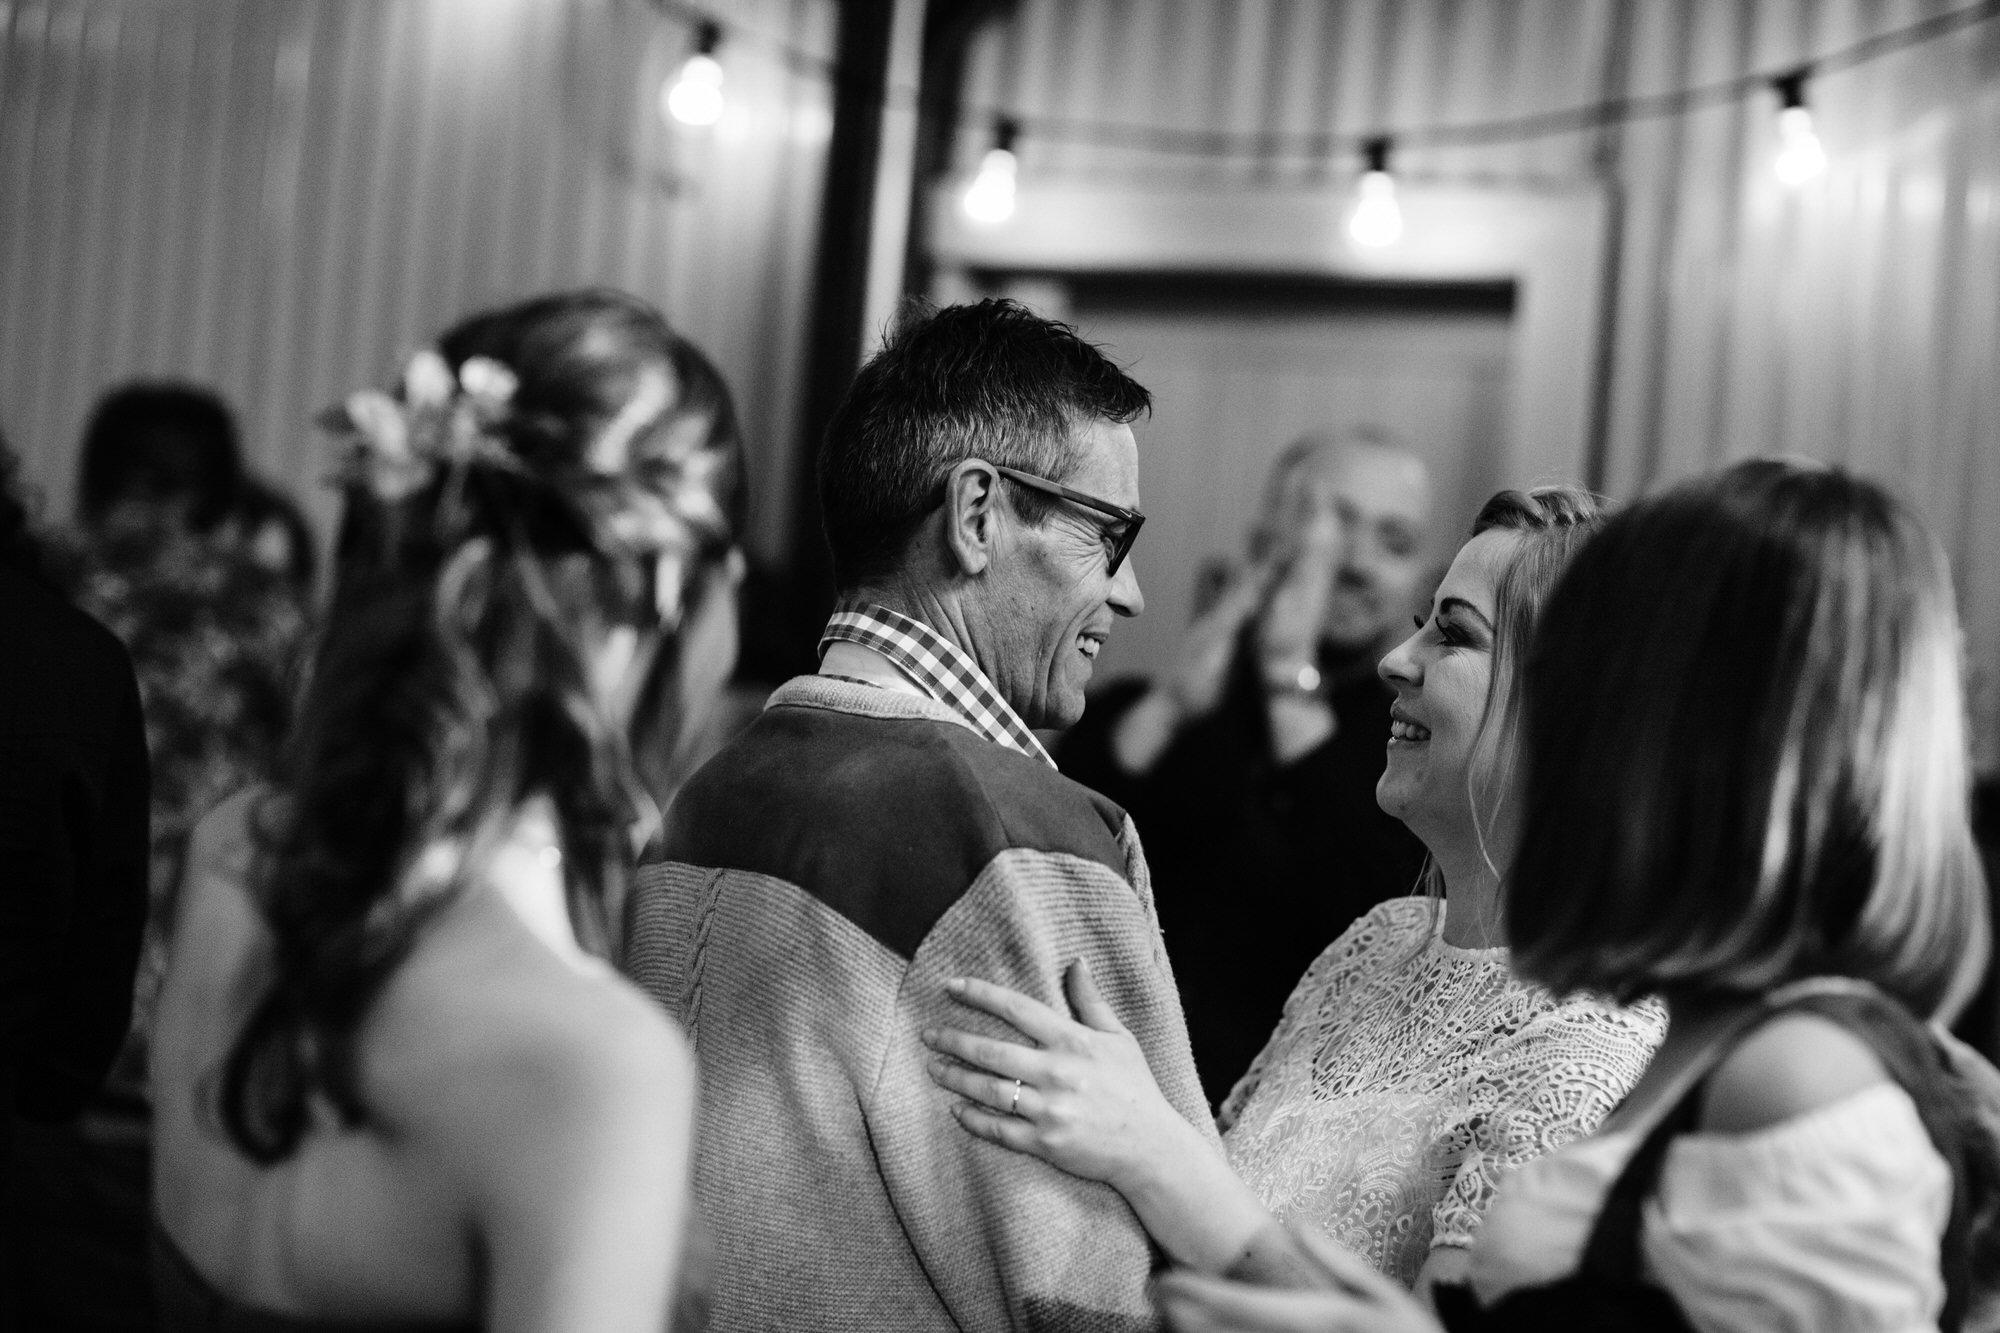 062 TIN SHED KNOCKRAICH WEDDING AUSTRIAN SCOTTISH ZOE ALEXANDRA PHOTOGRAPHY